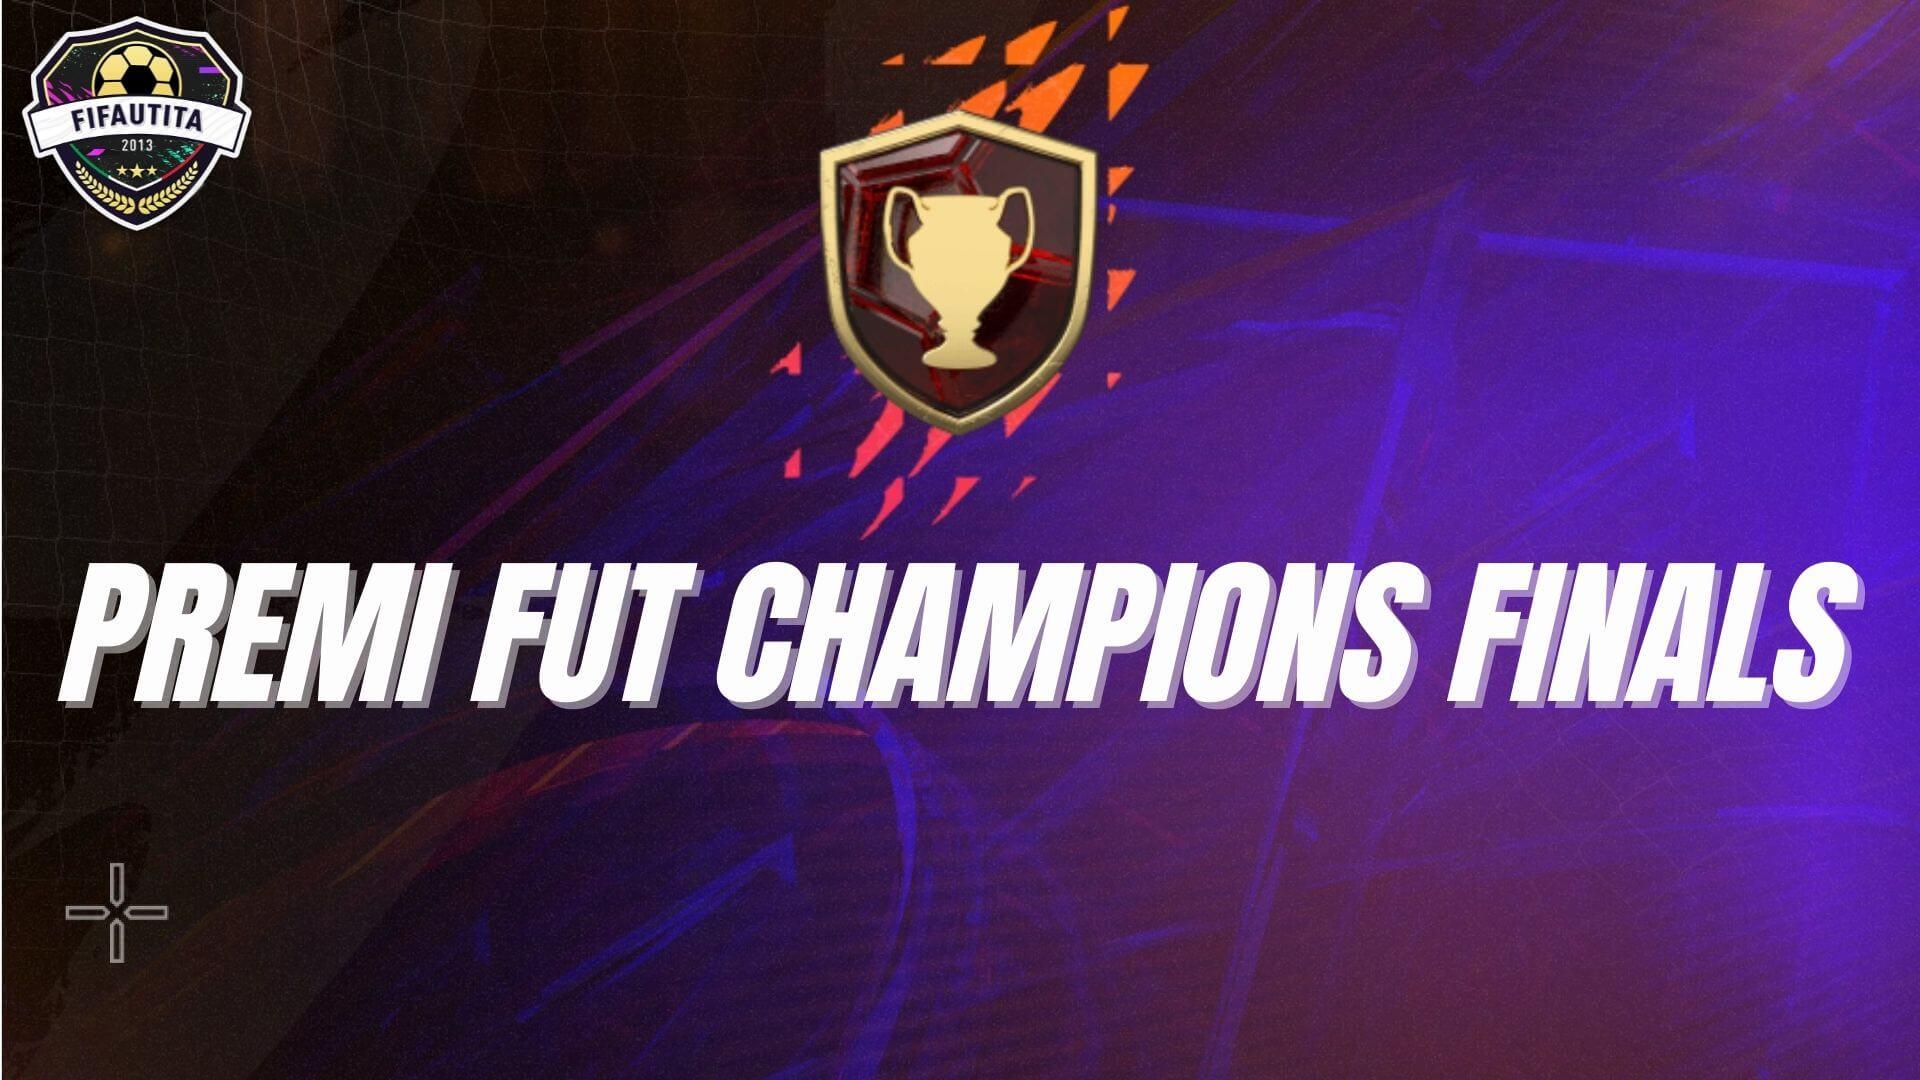 FIFA 22: Premi FUT Champions Finals